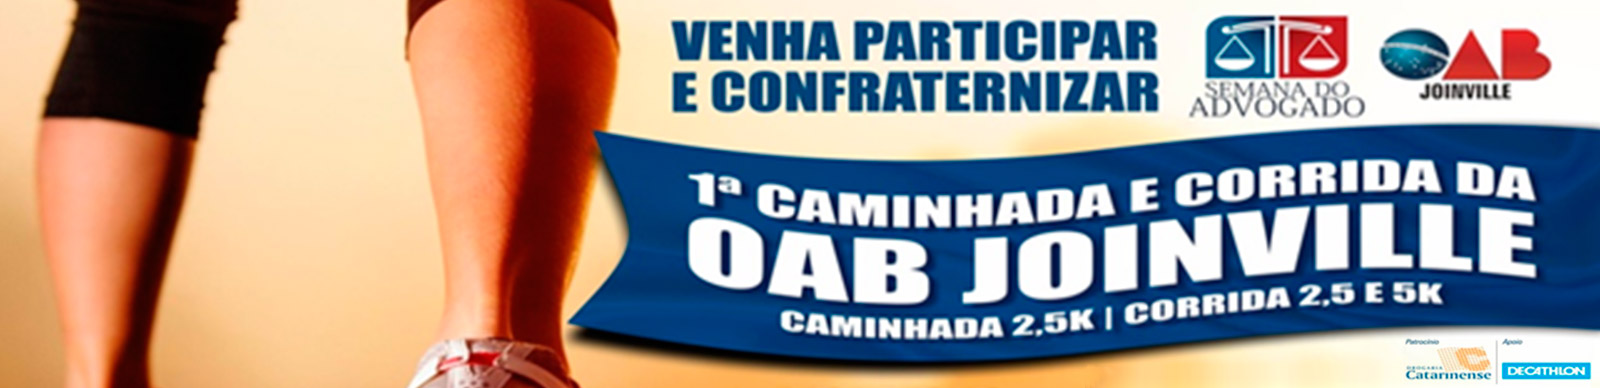 CORRIDA OAB JOINVILLE - Imagem de topo